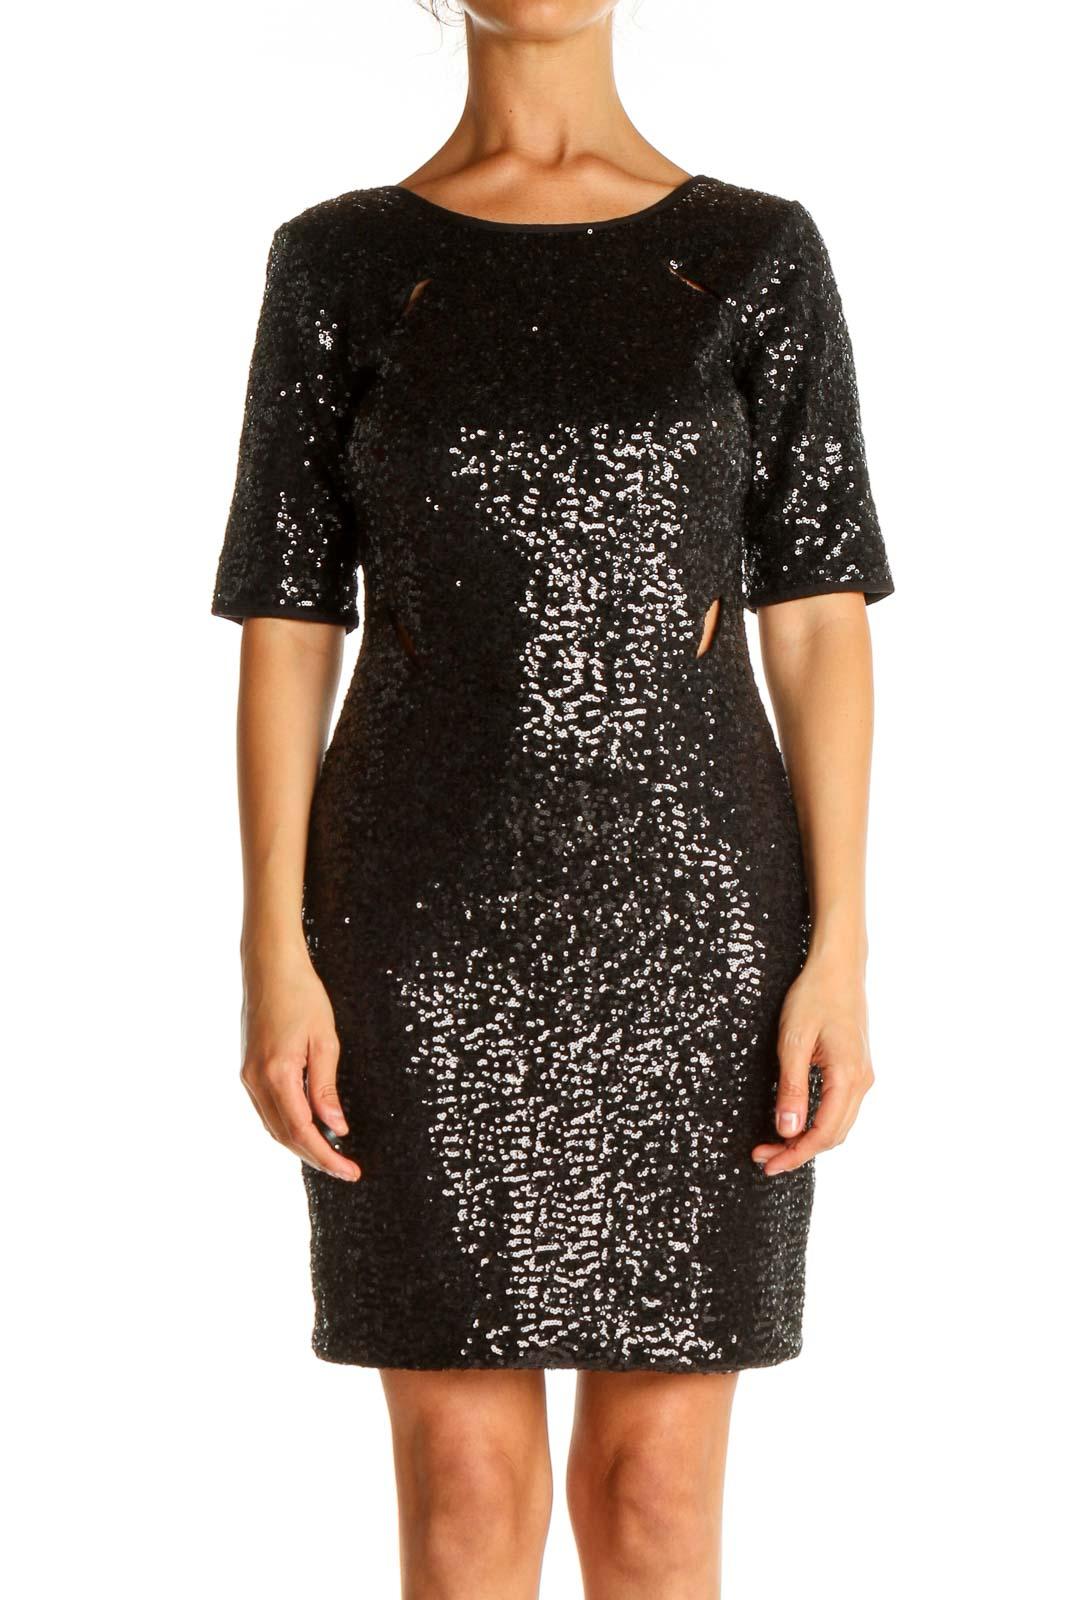 Black Sequin Cocktail Sheath Dress Front